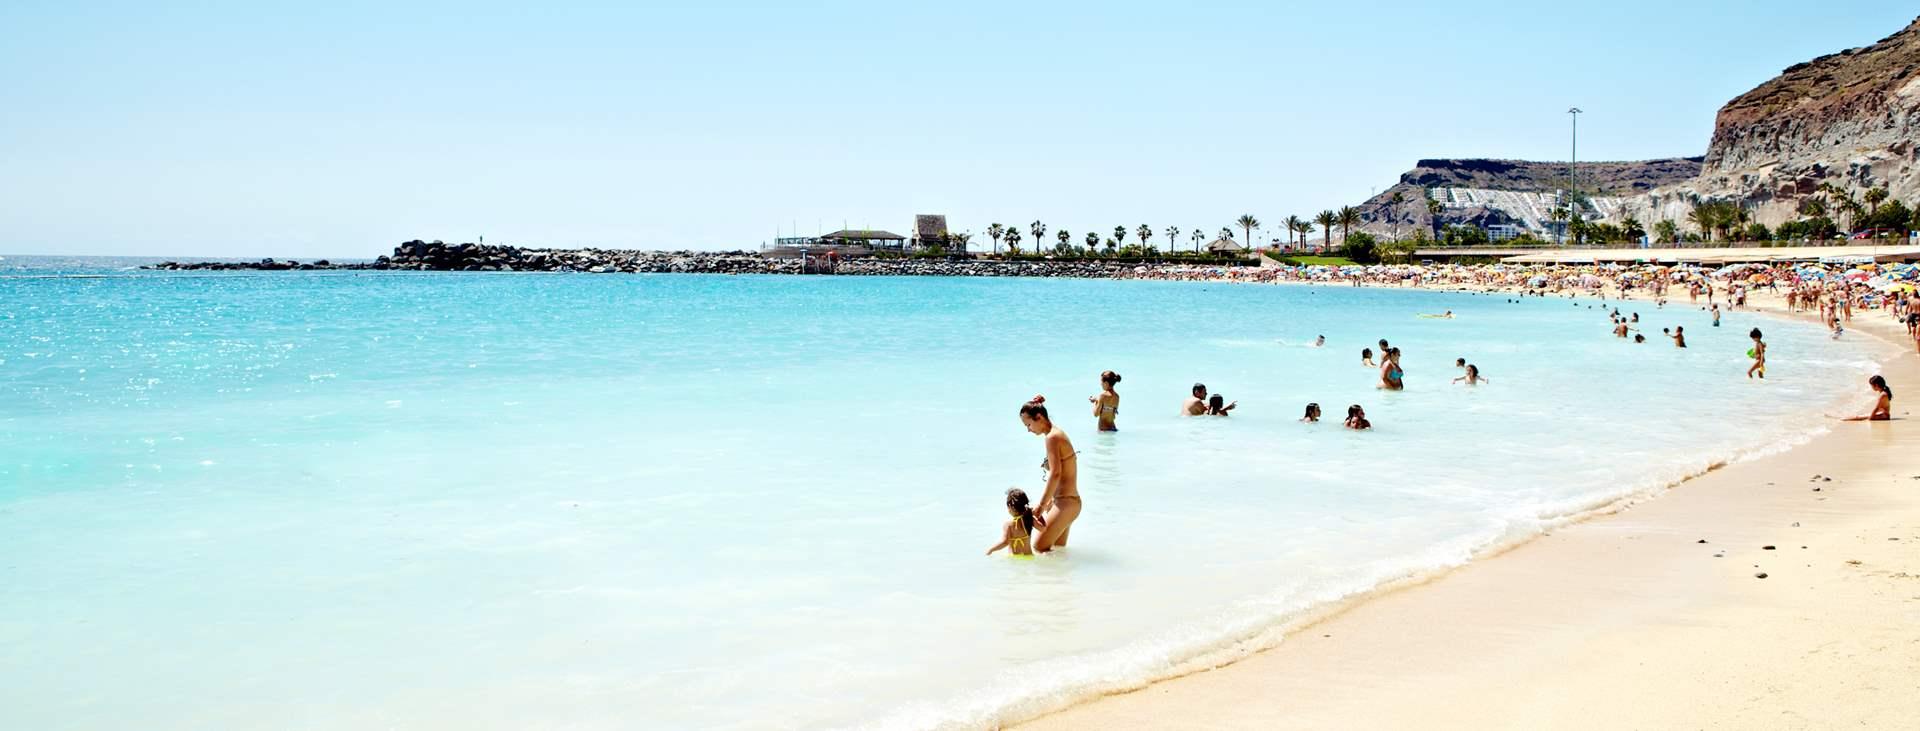 Bestill en reise med All Inclusive til Playa de Amadores på Gran Canaria